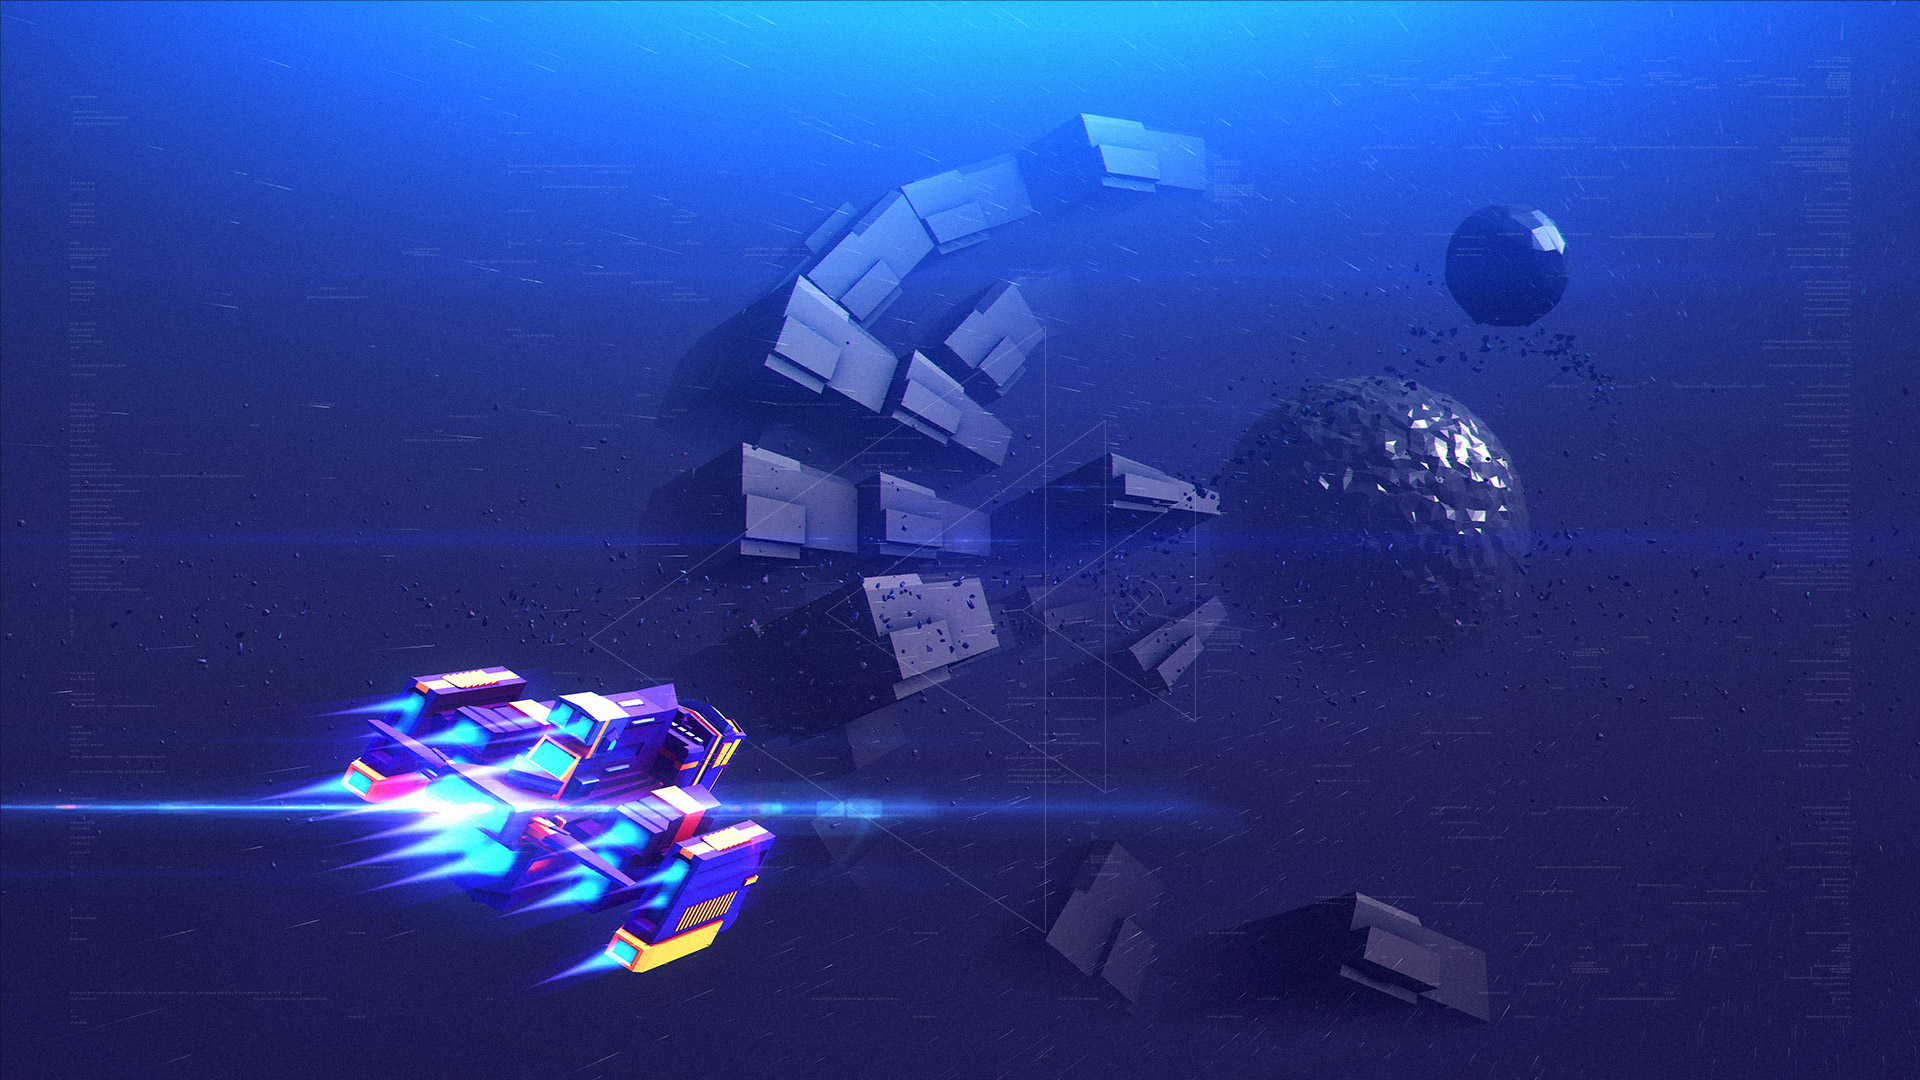 Space_Journey_Unity3D_AssetStore_Scifi.jpg